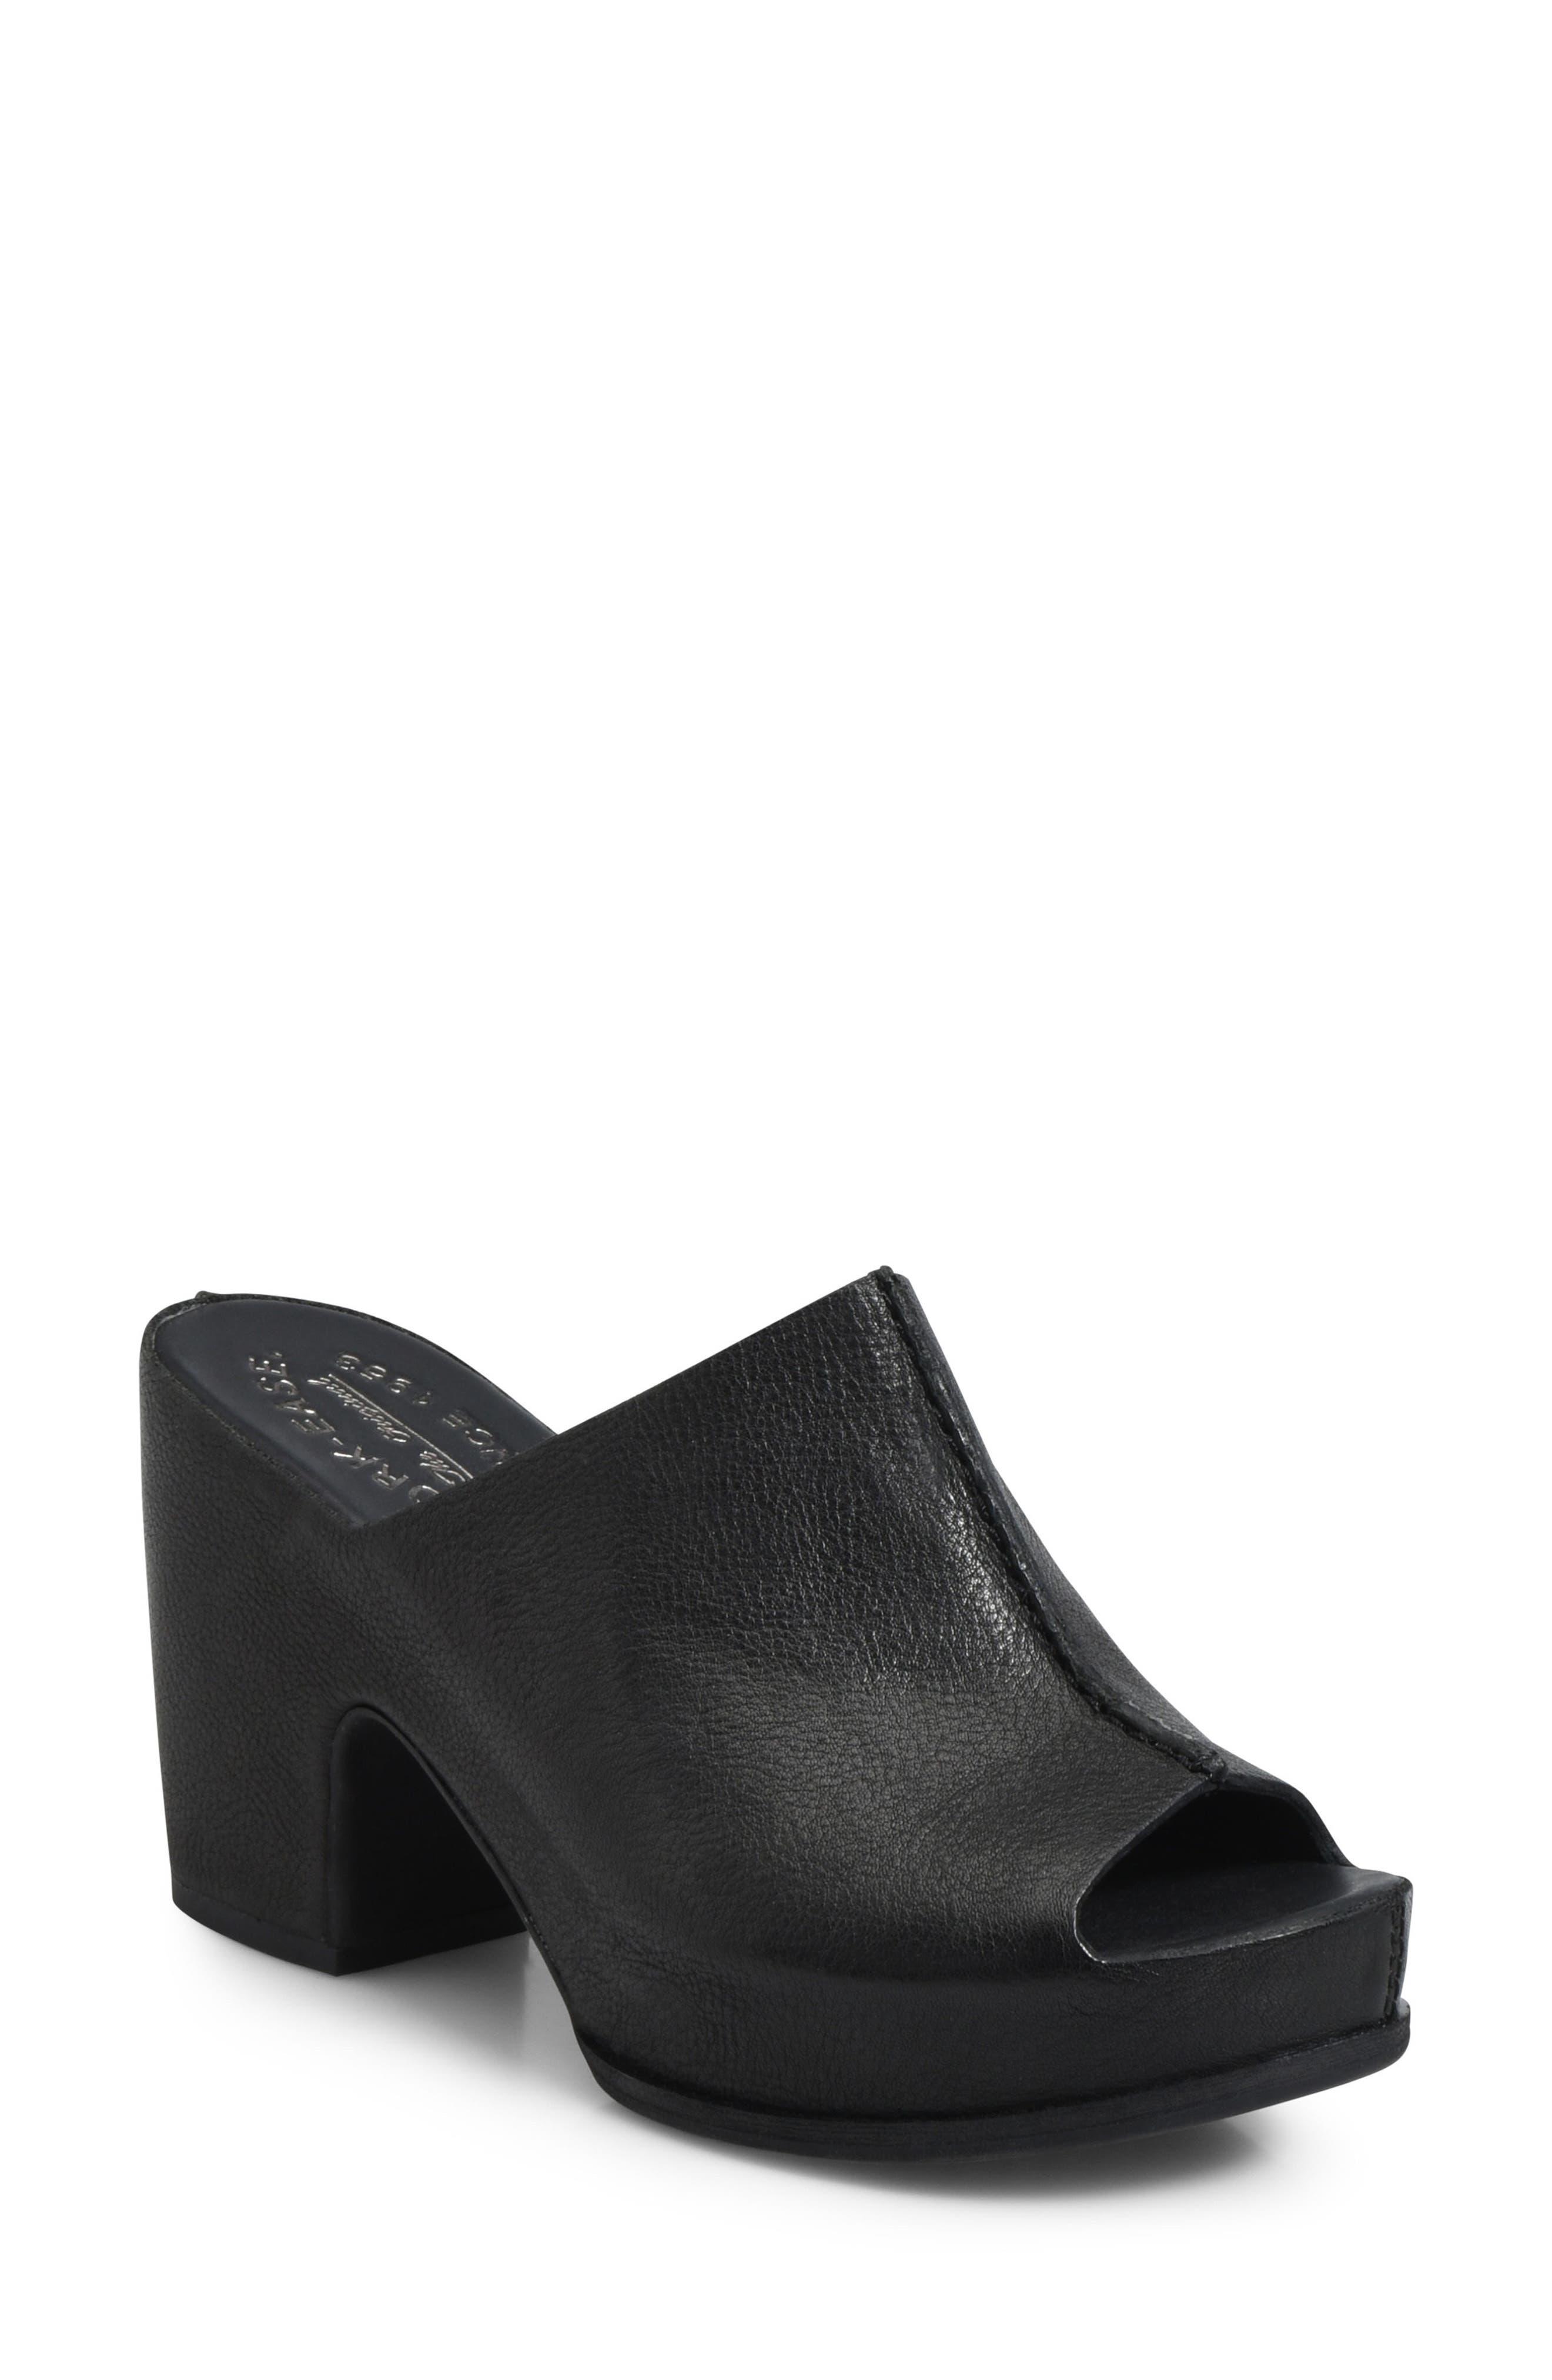 KORK-EASE<SUP>®</SUP> Santa Ana Platform Mule, Main, color, BLACK LEATHER